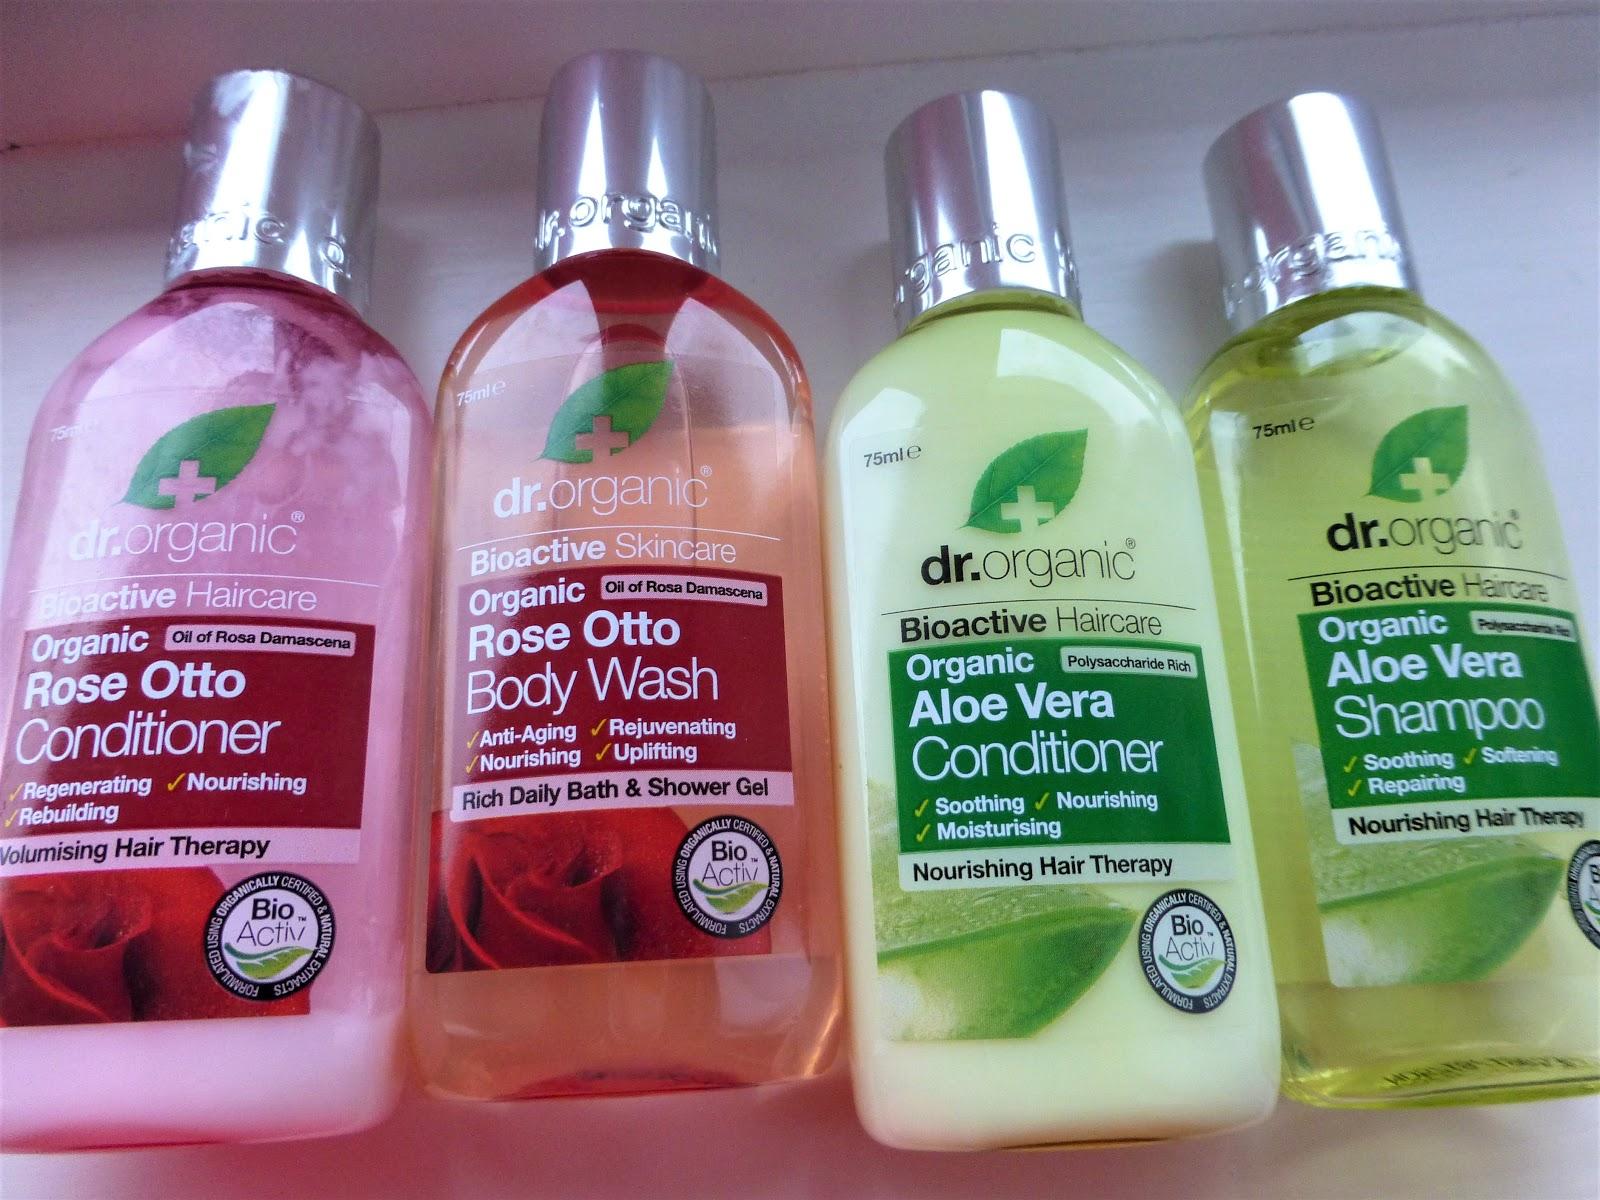 Health & Beauty 2x Deep Steep 100% Organic Usda Nails Skin Hair Vegan Gluten Free Overall Care Other Bath & Body Supplies